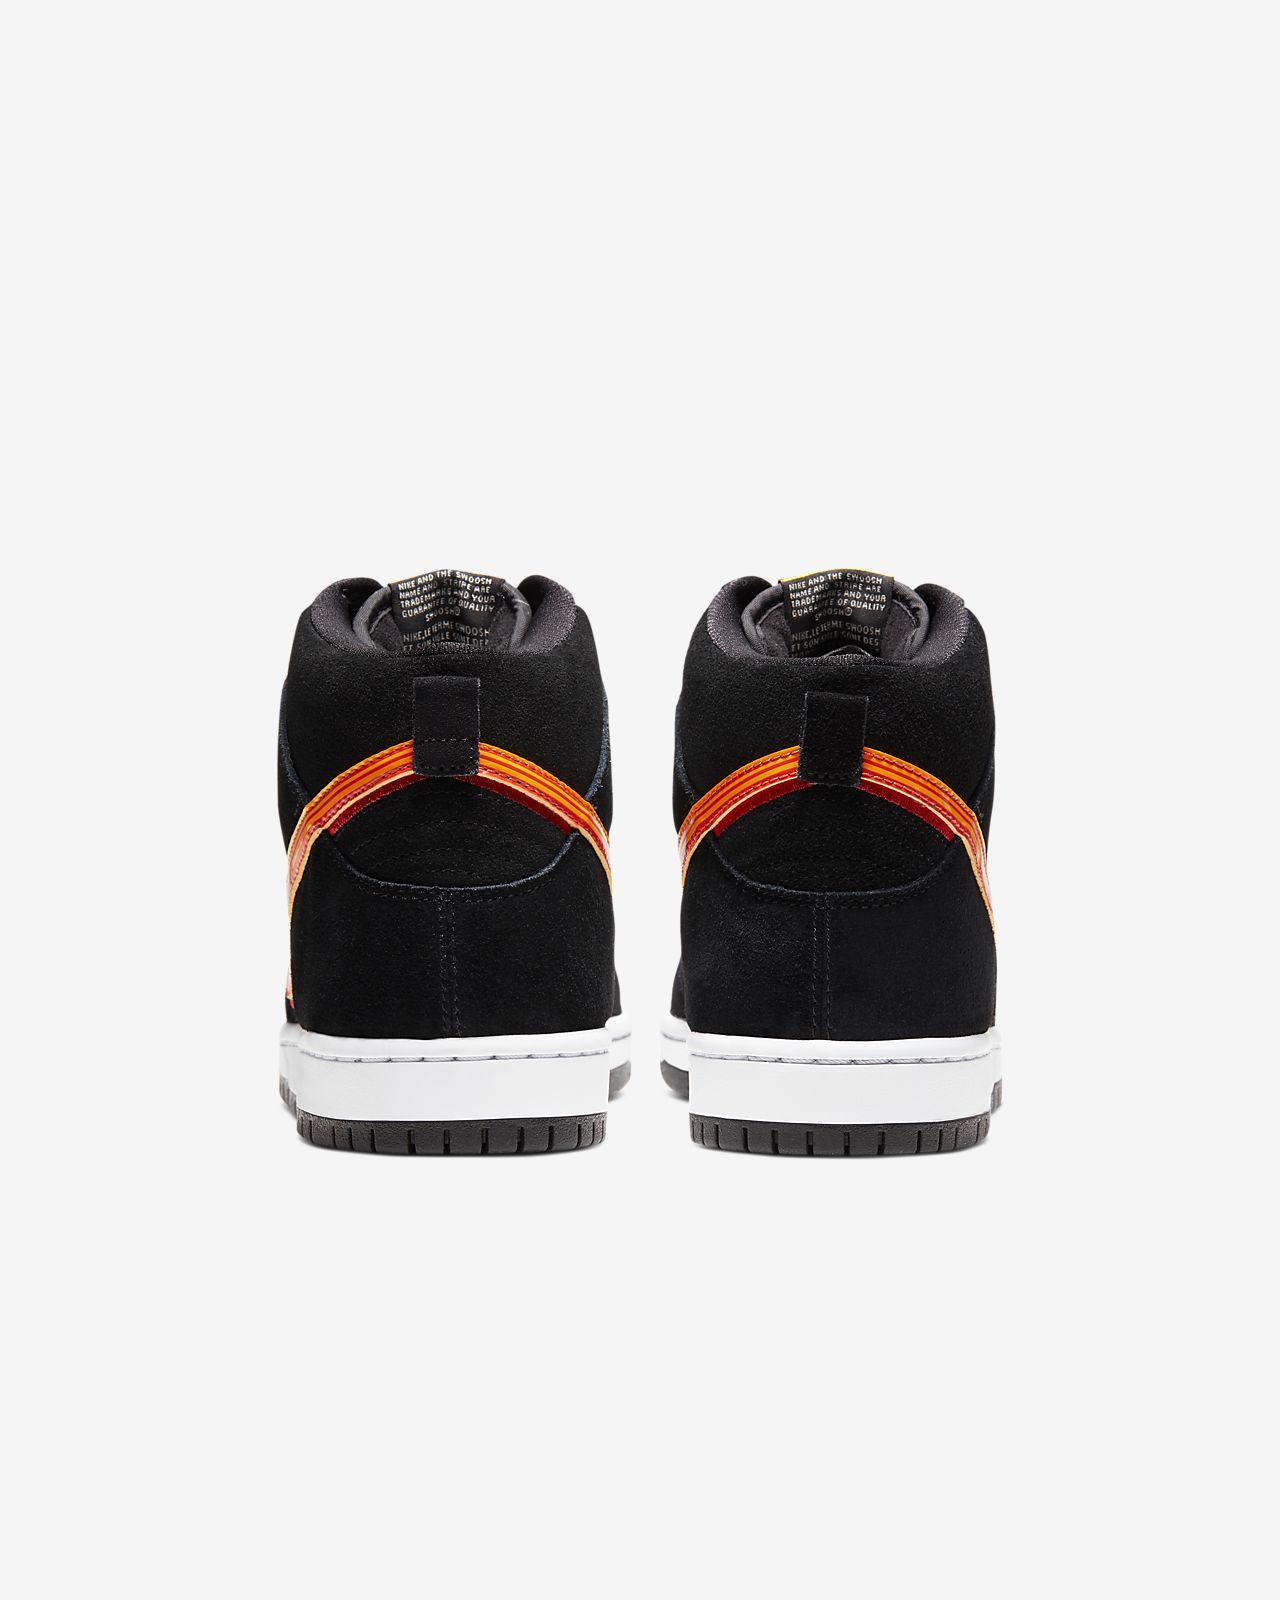 Sapatilhas de skateboard Nike SB Dunk High Pro para homem